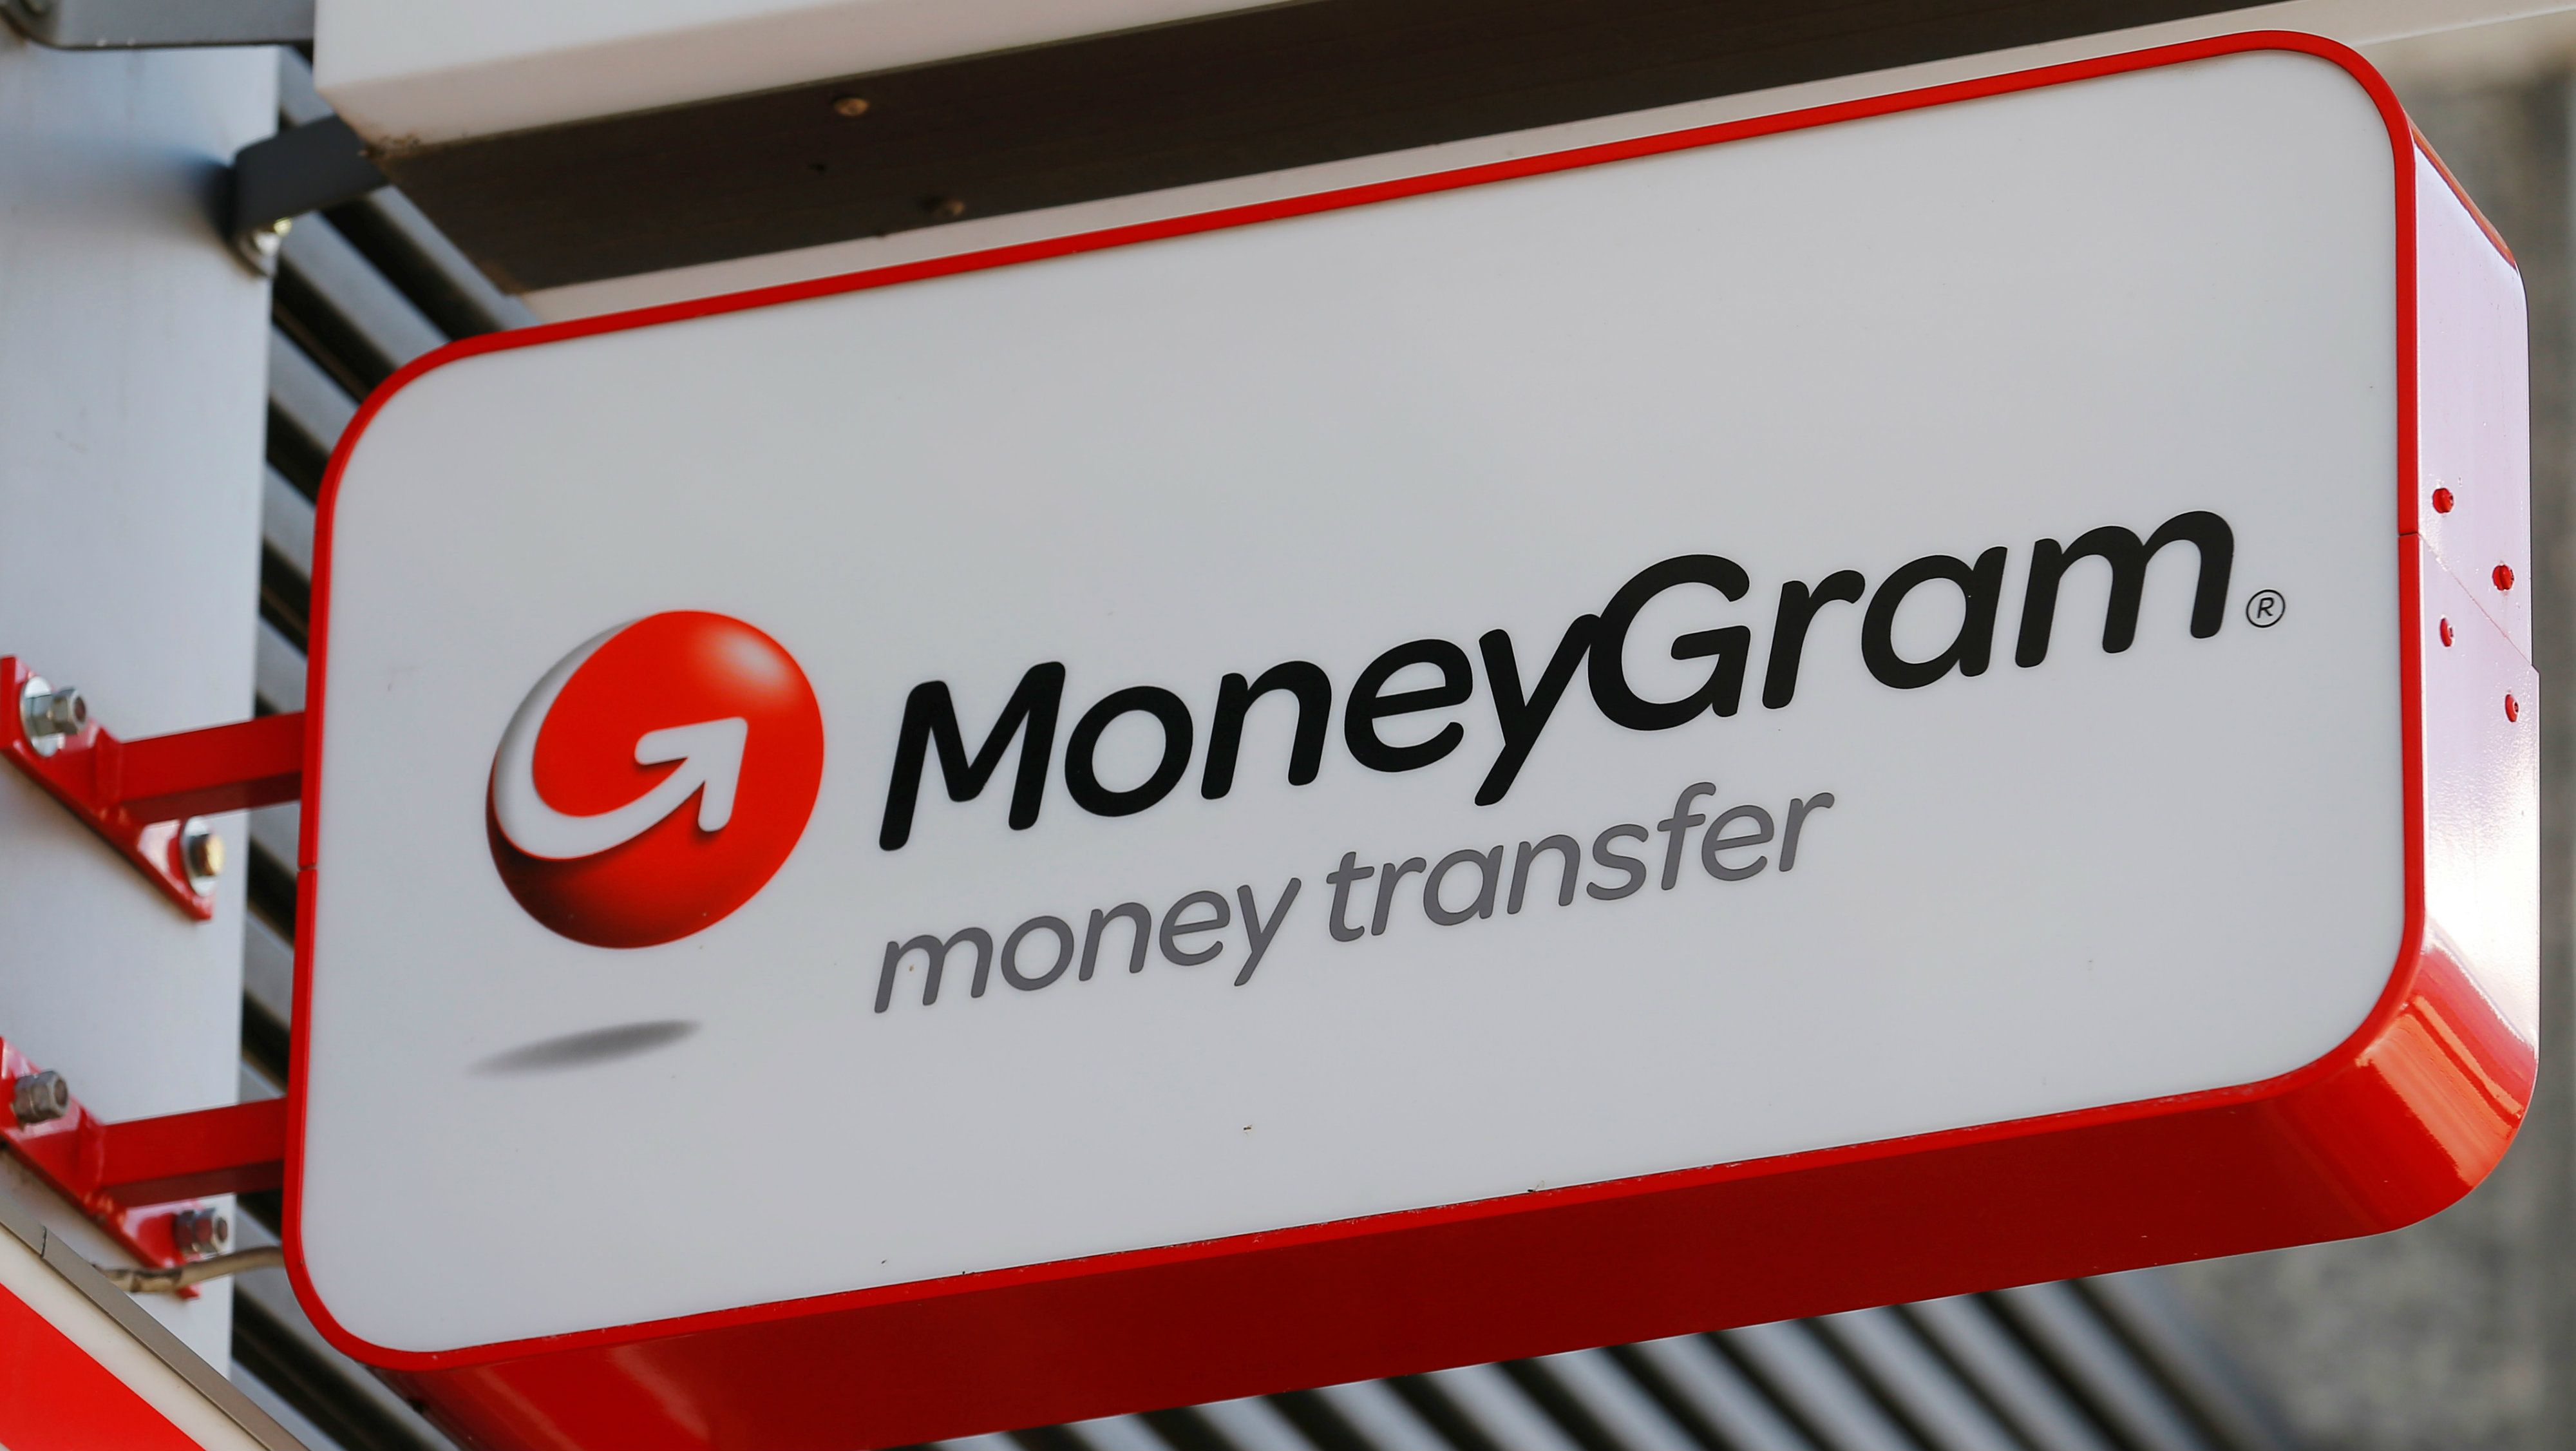 MoneyGram starts direct money transfer to bank accounts in Ghana - Ghana  Business News